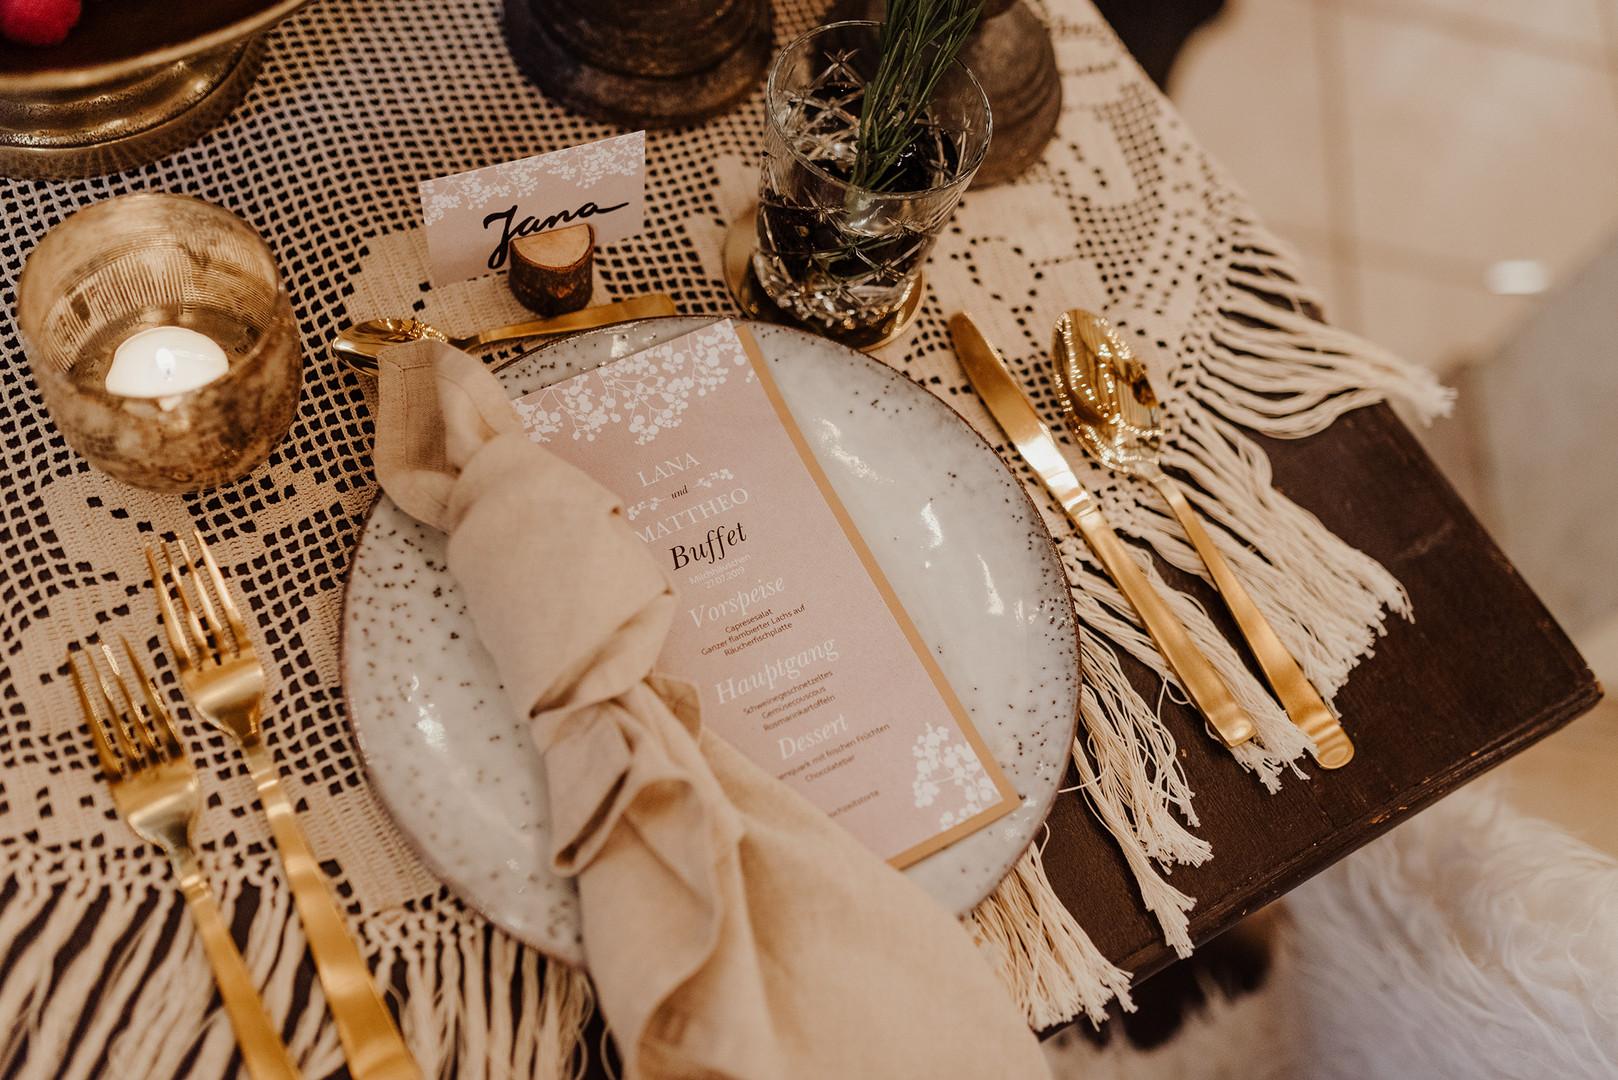 Vintagewedding Tischdeko.jpeg